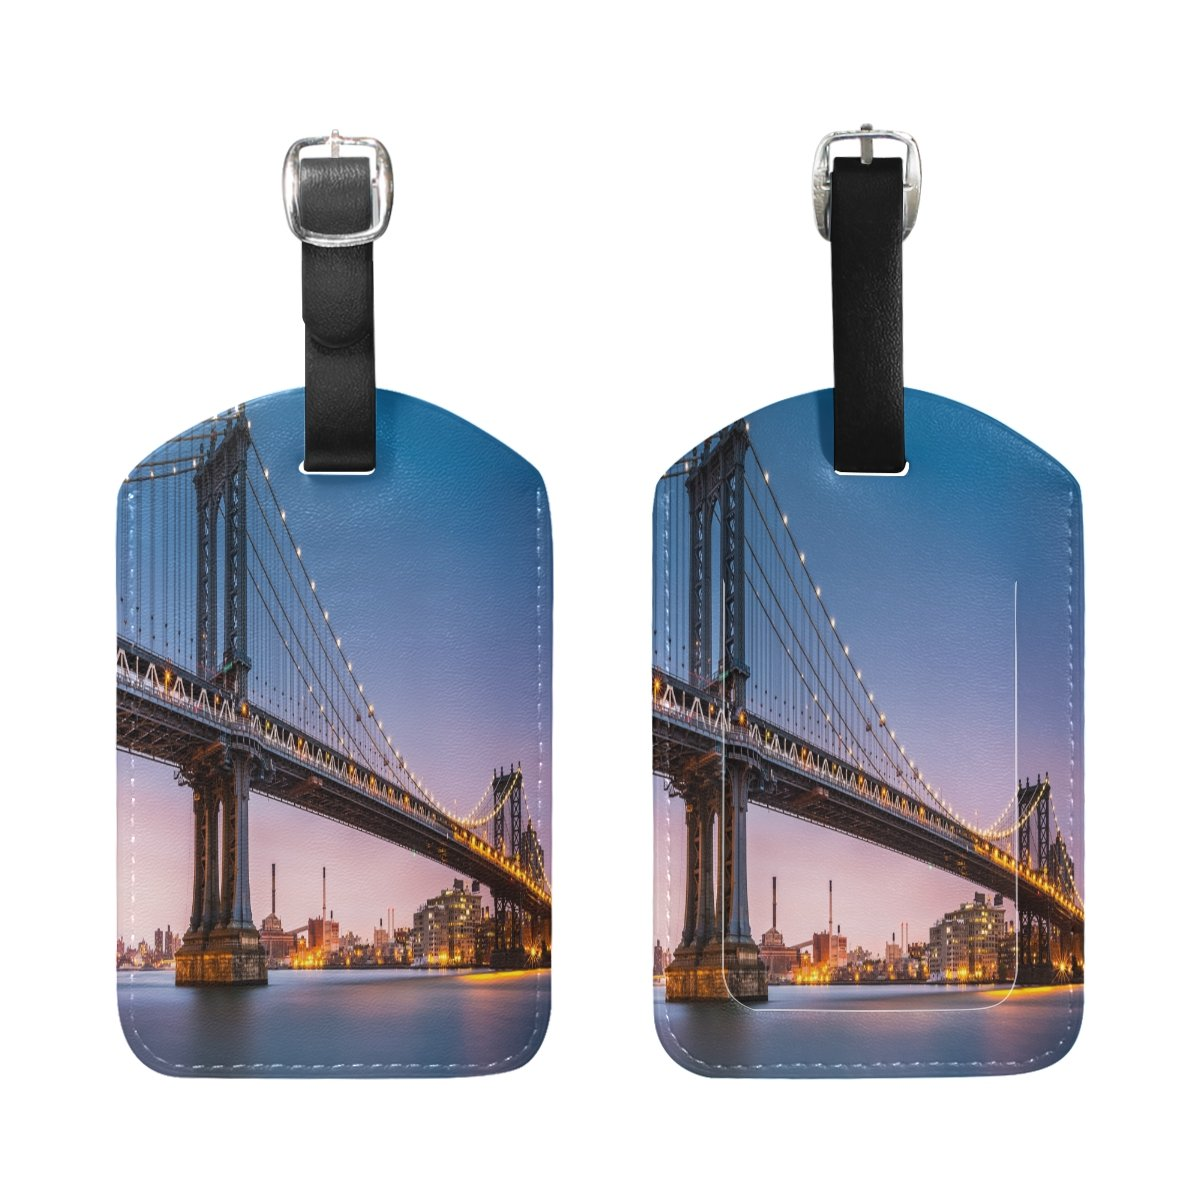 Saobao Travel Luggage Tag Manhattan Bridge Dusk PU Leather Baggage Suitcase Travel ID Bag Tag 1Pcs